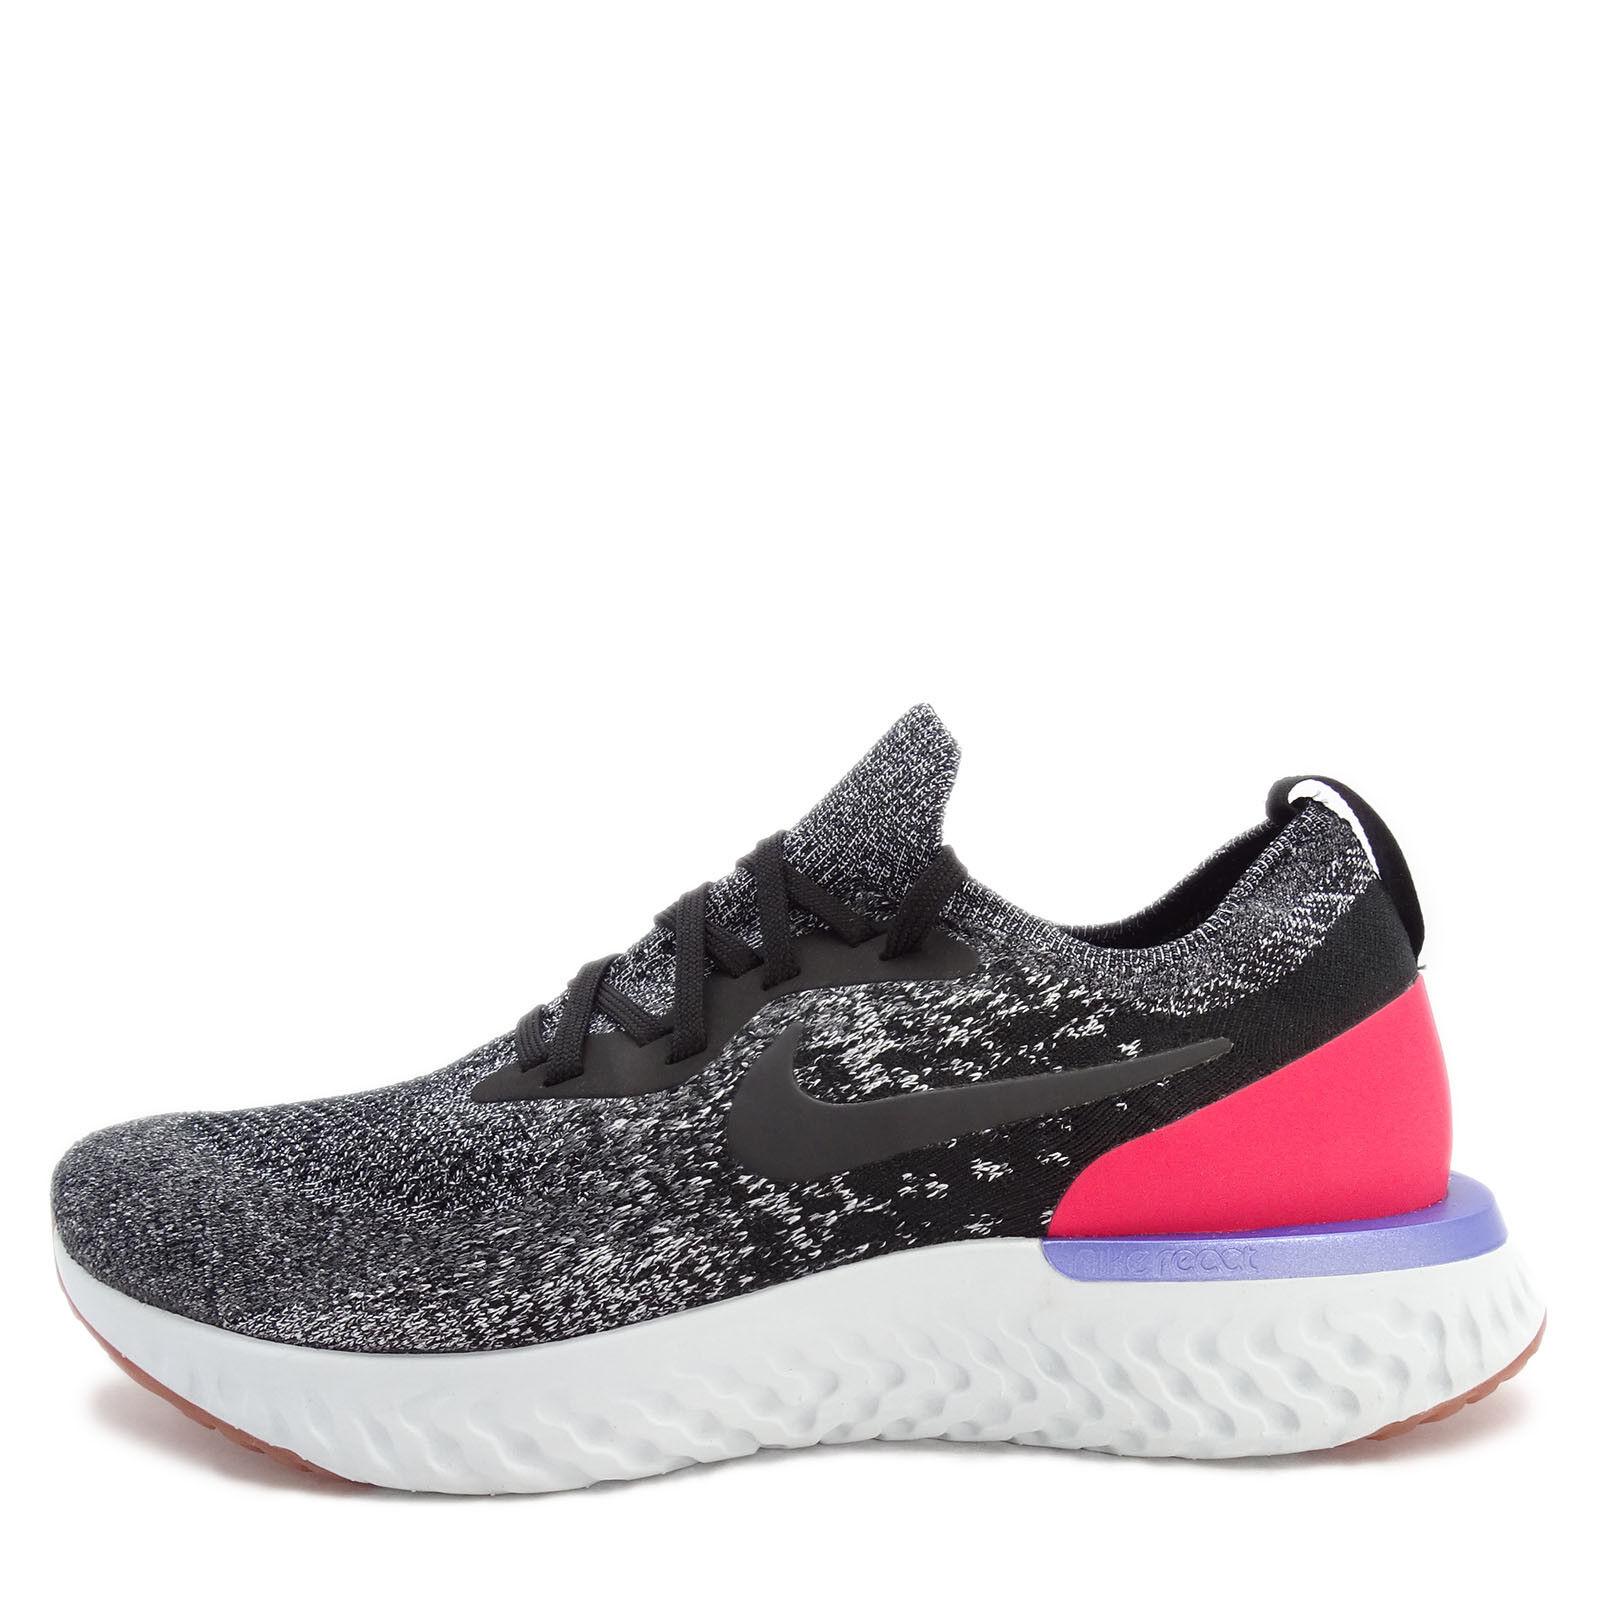 Nike Epic React Shoes Flyknit [AQ0067-006] Men Running Shoes React Black/White-Red Orbit 677f06